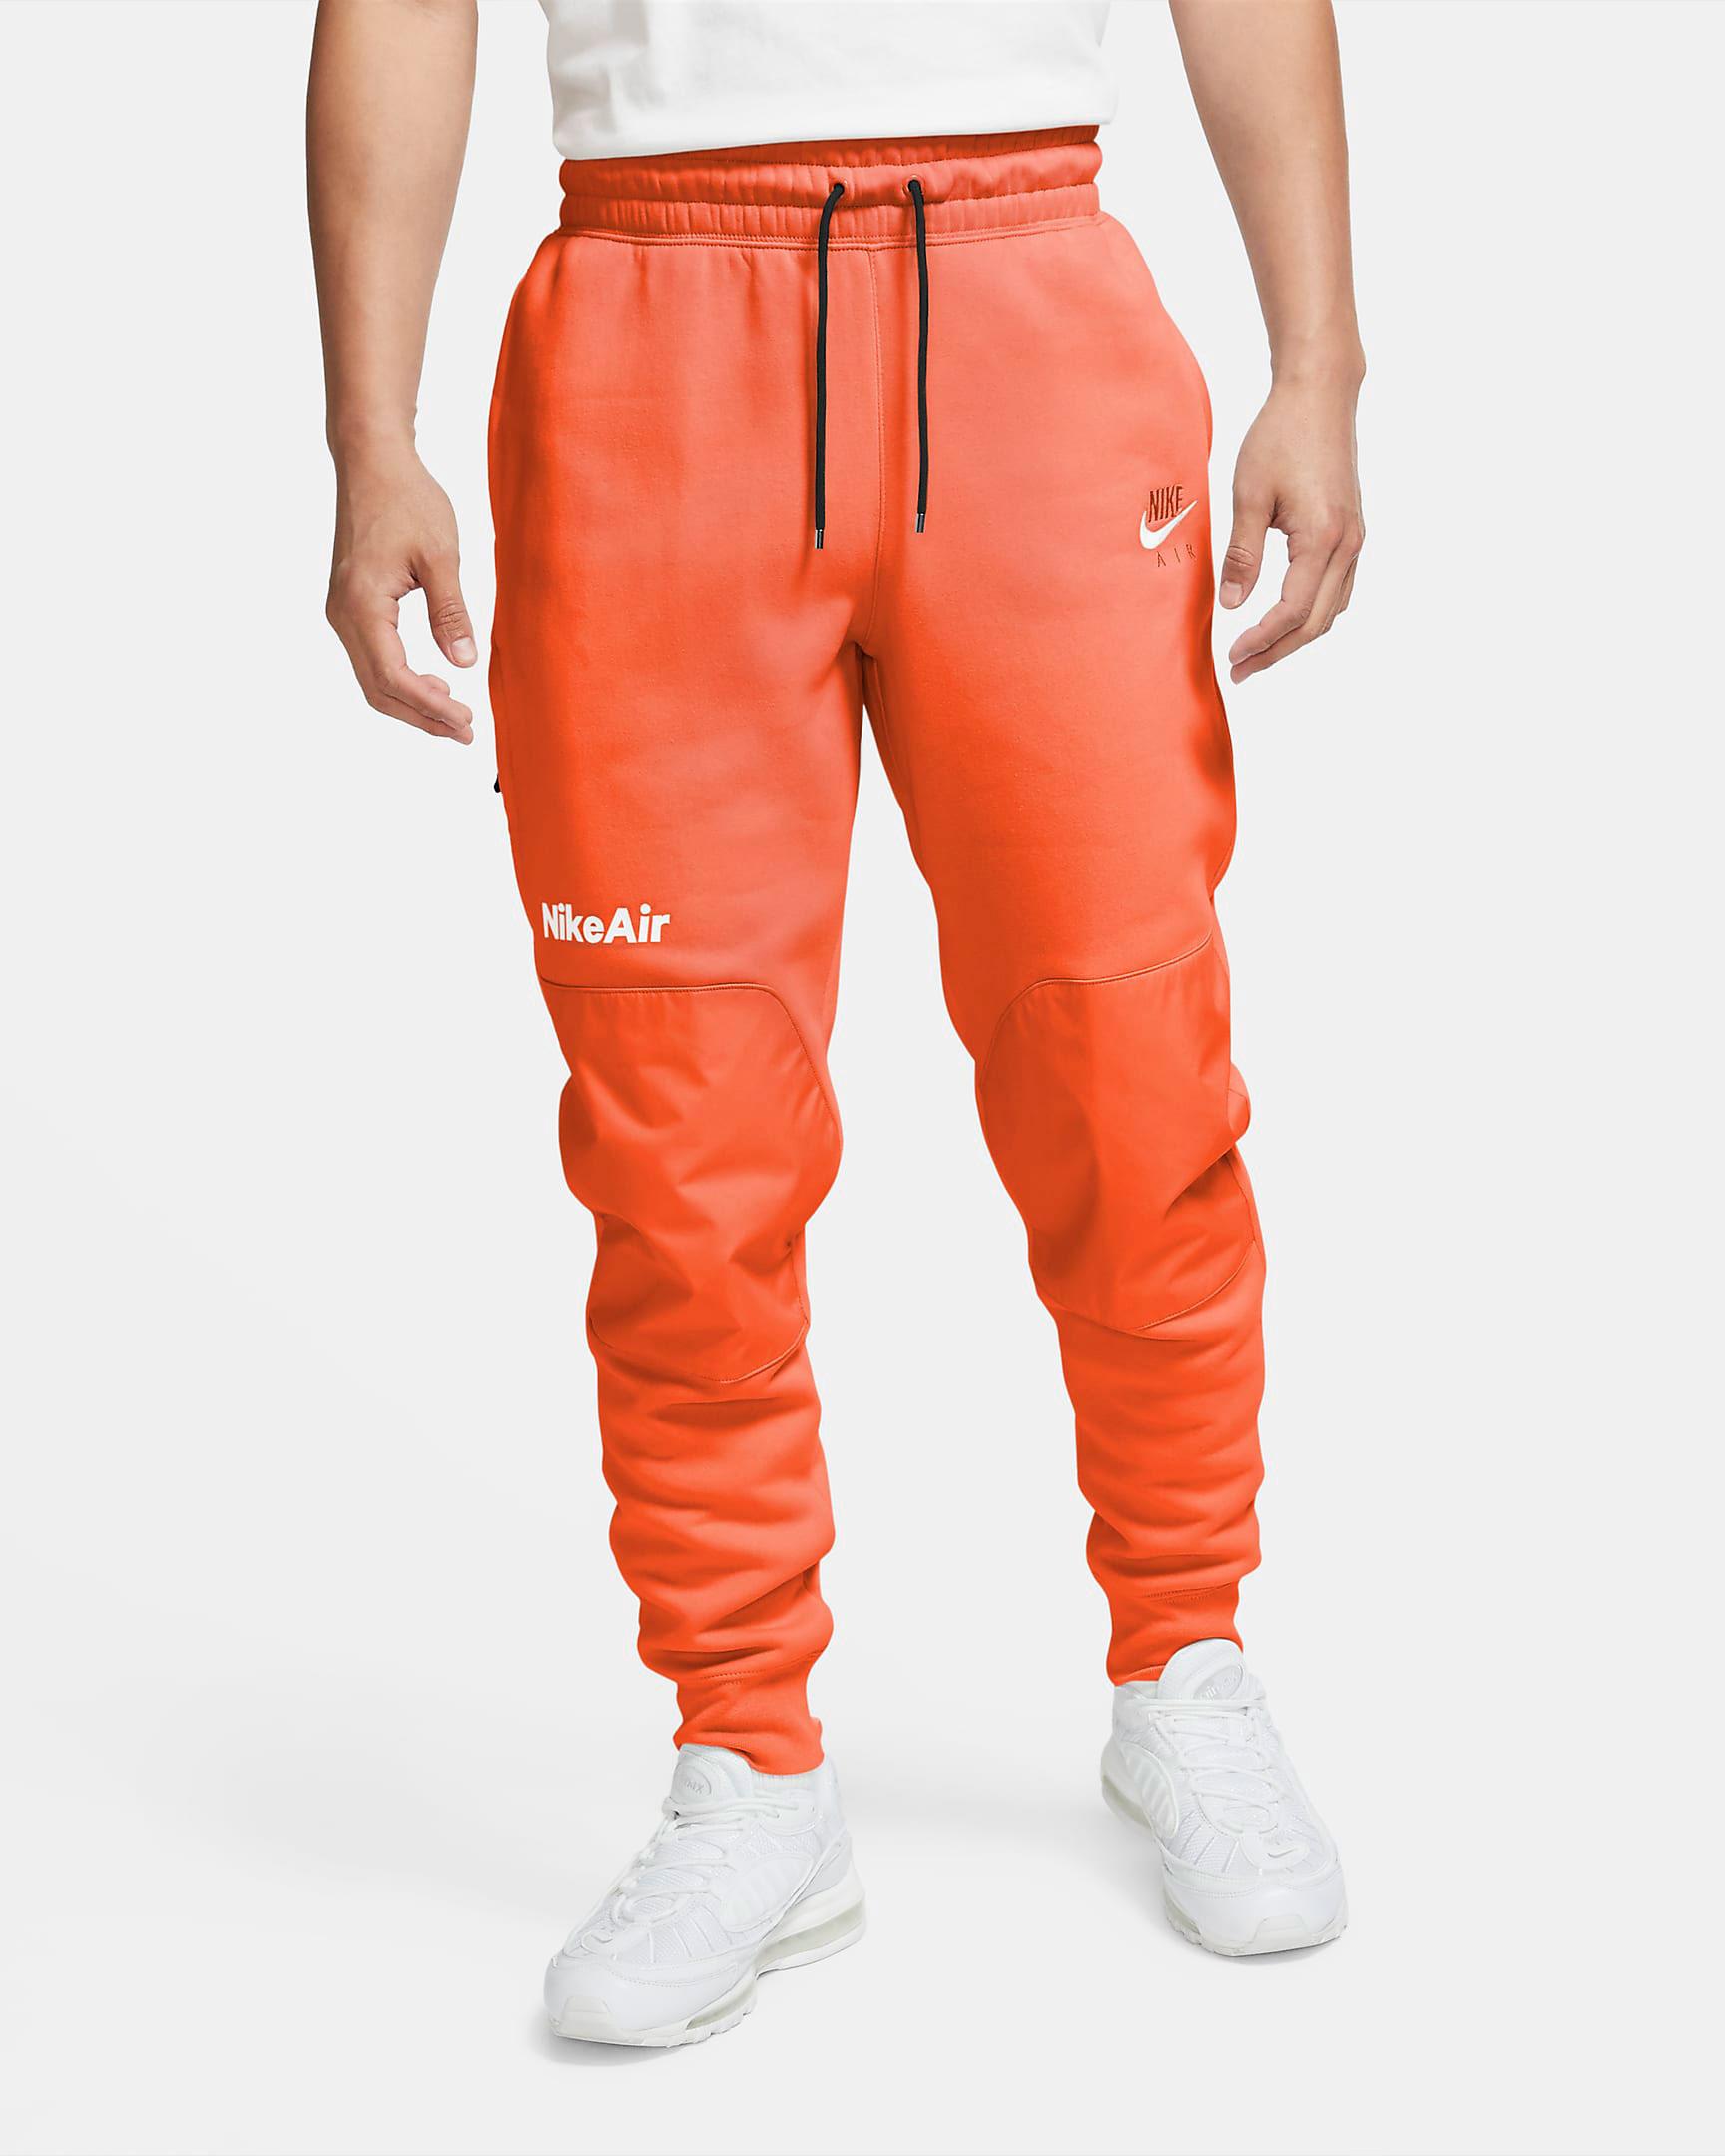 nike-air-fleece-pants-electro-orange